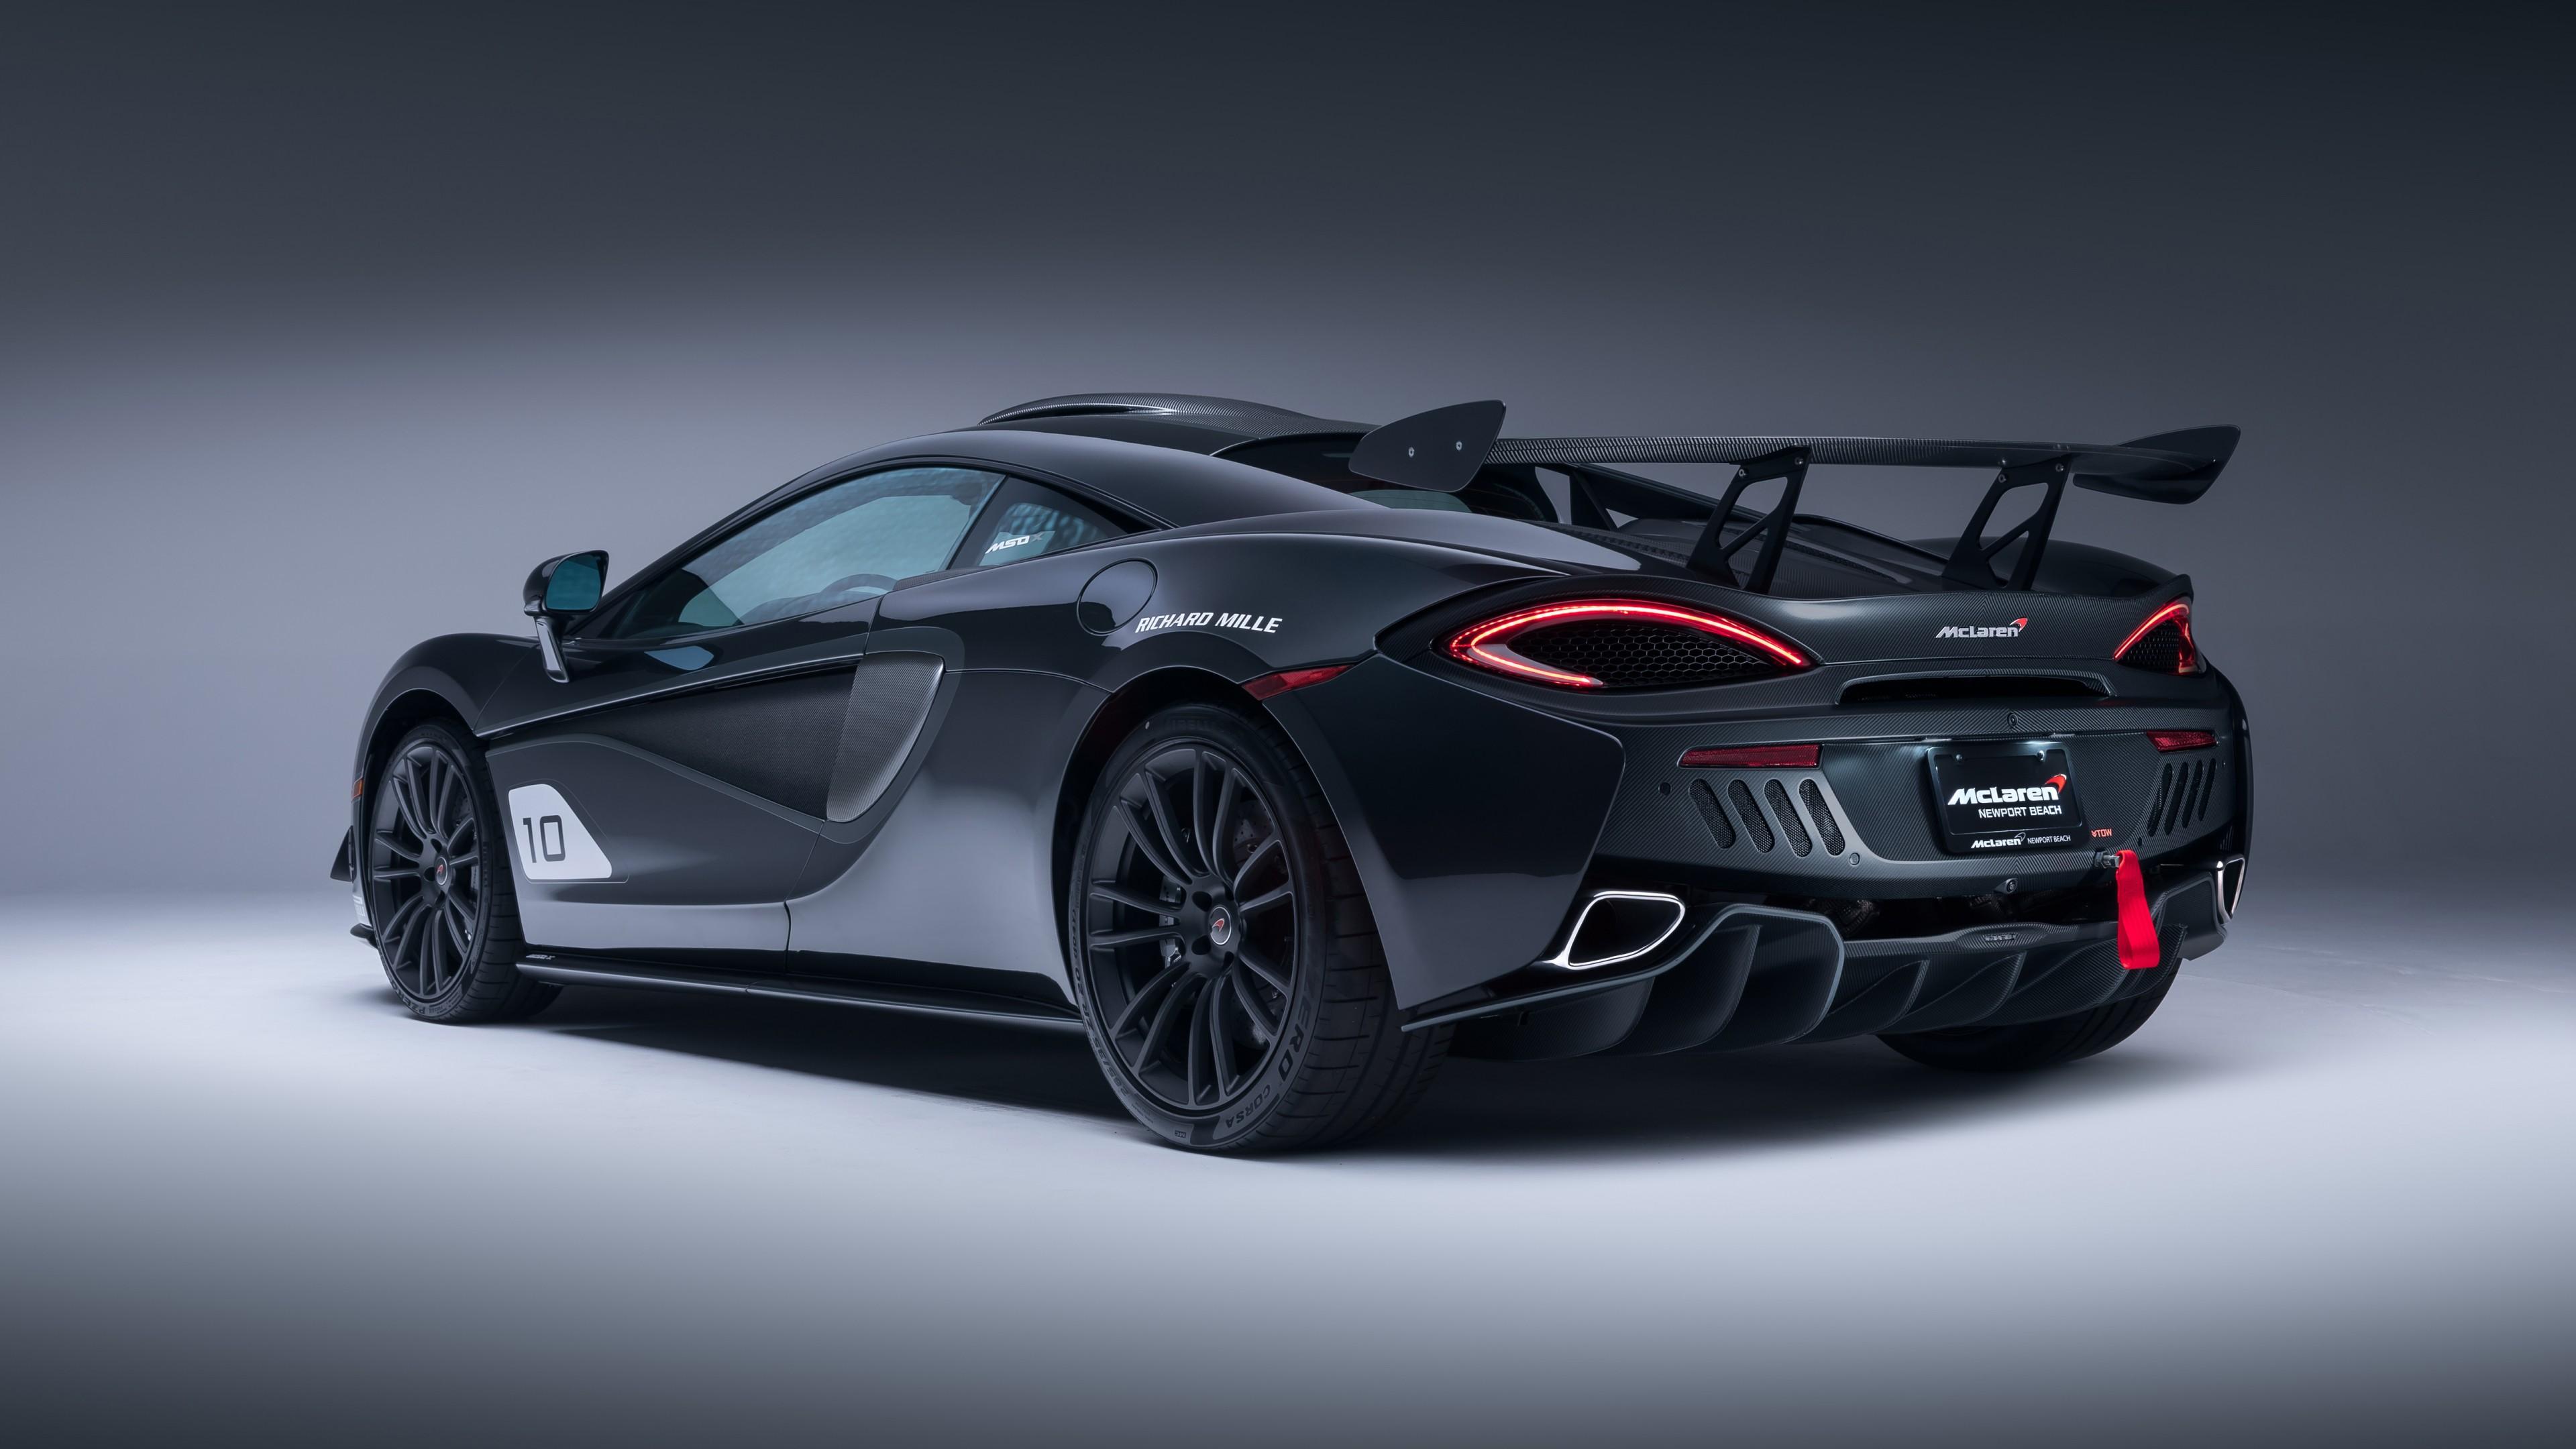 2018 McLaren MSO 10 Grey Black 5K 5 Wallpaper | HD Car ...